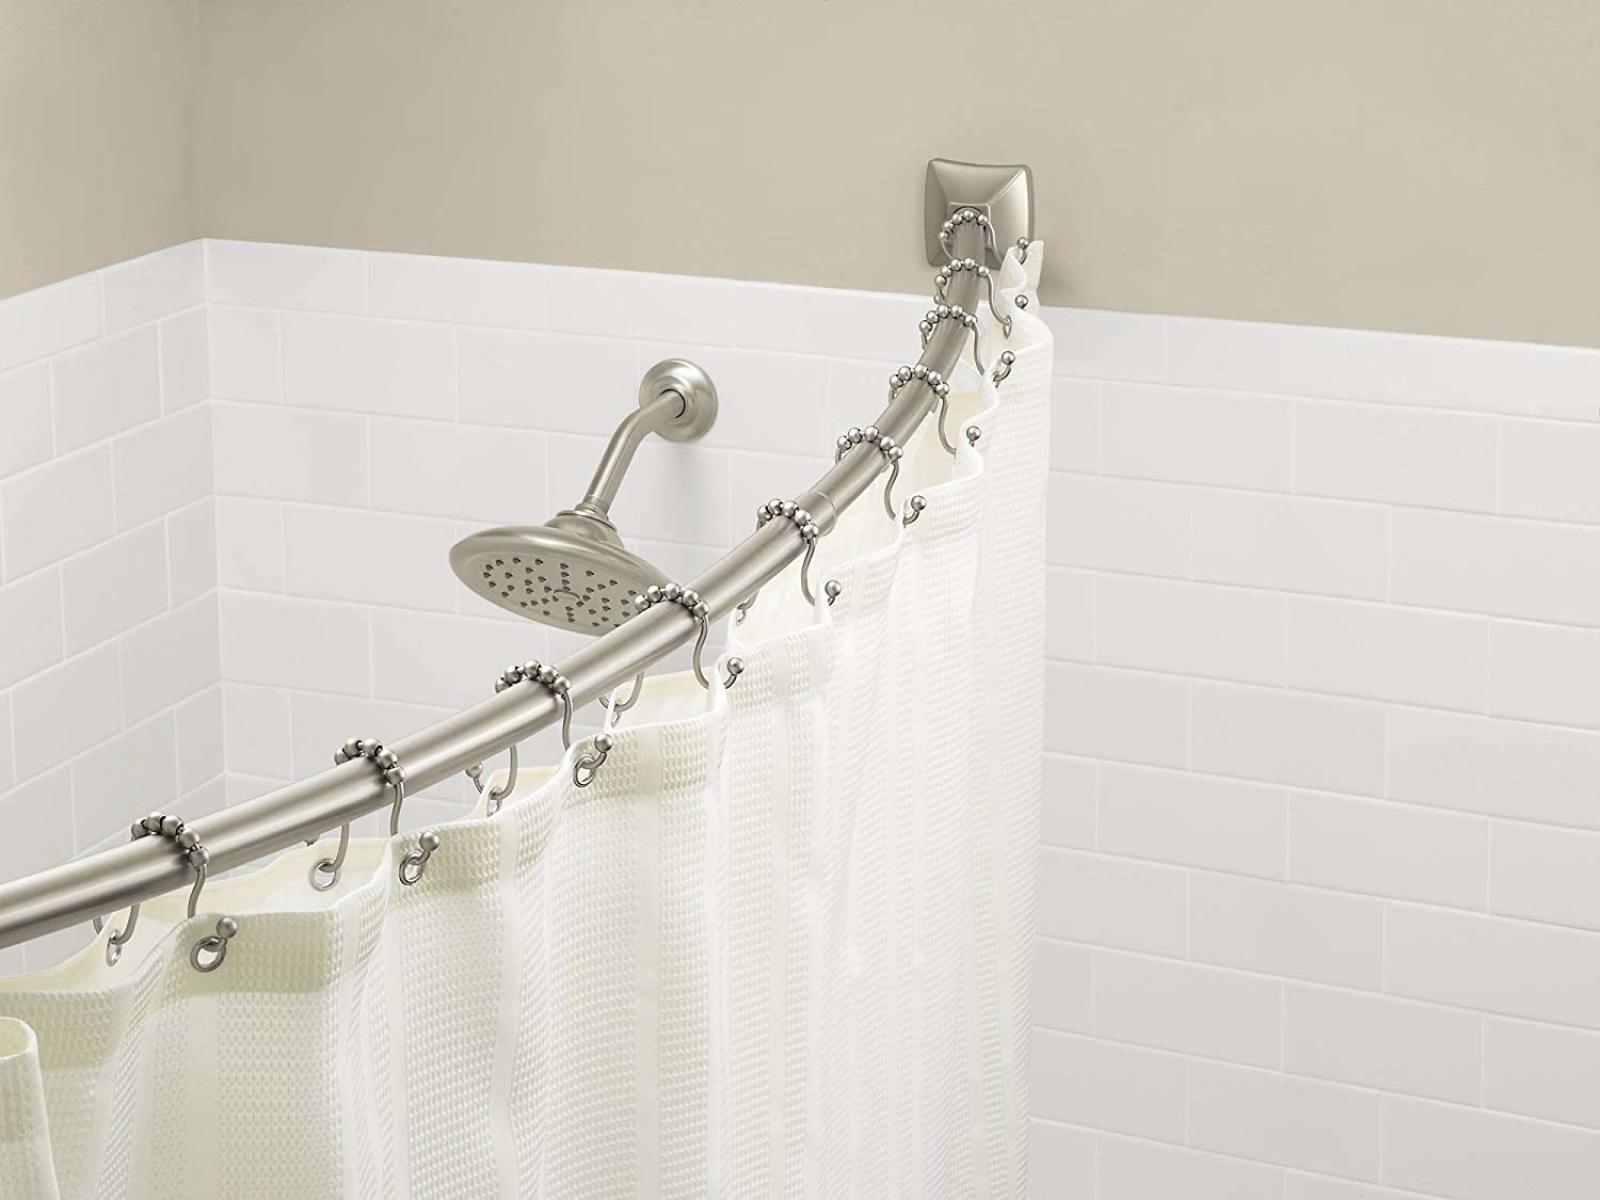 180 degree shower curtain rod black and decker powershot stapler